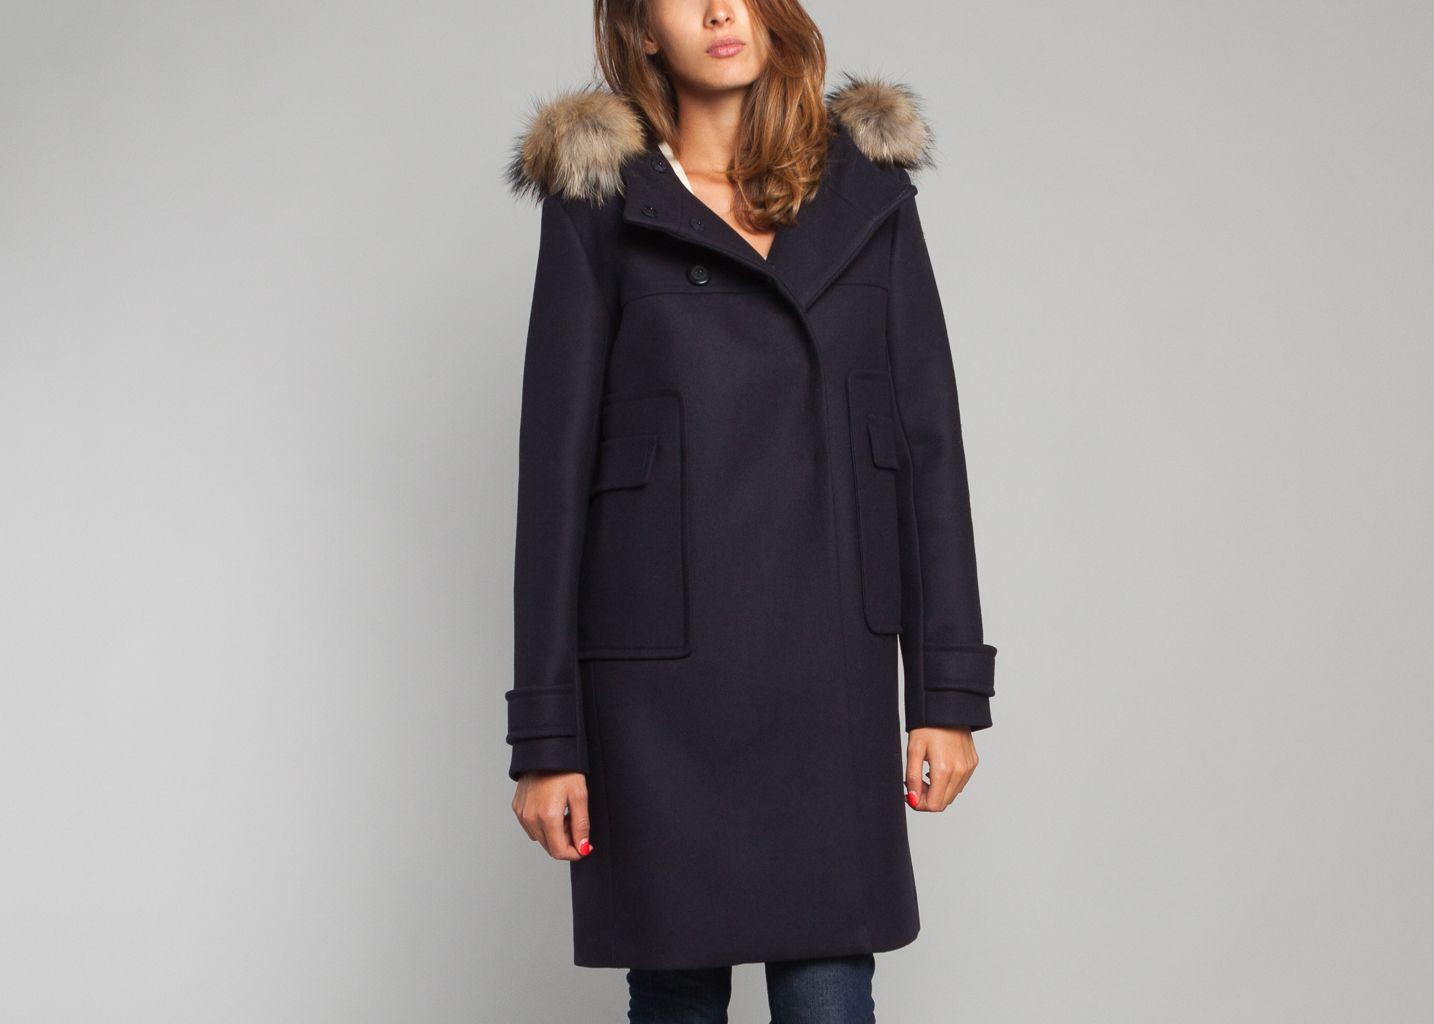 Manteau capuche tara jarmon